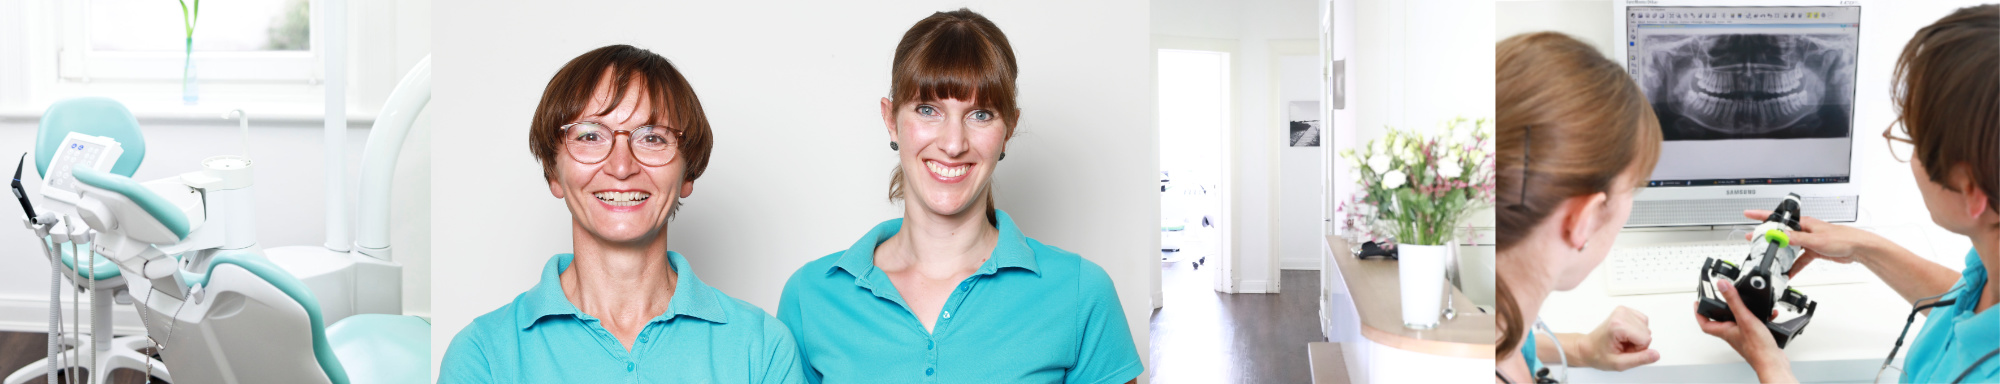 Zahnarztpraxis Hamburg Altona Ottensen Endodontie Wurzelbehandlungen CMD Dr Gerdes Kollegen